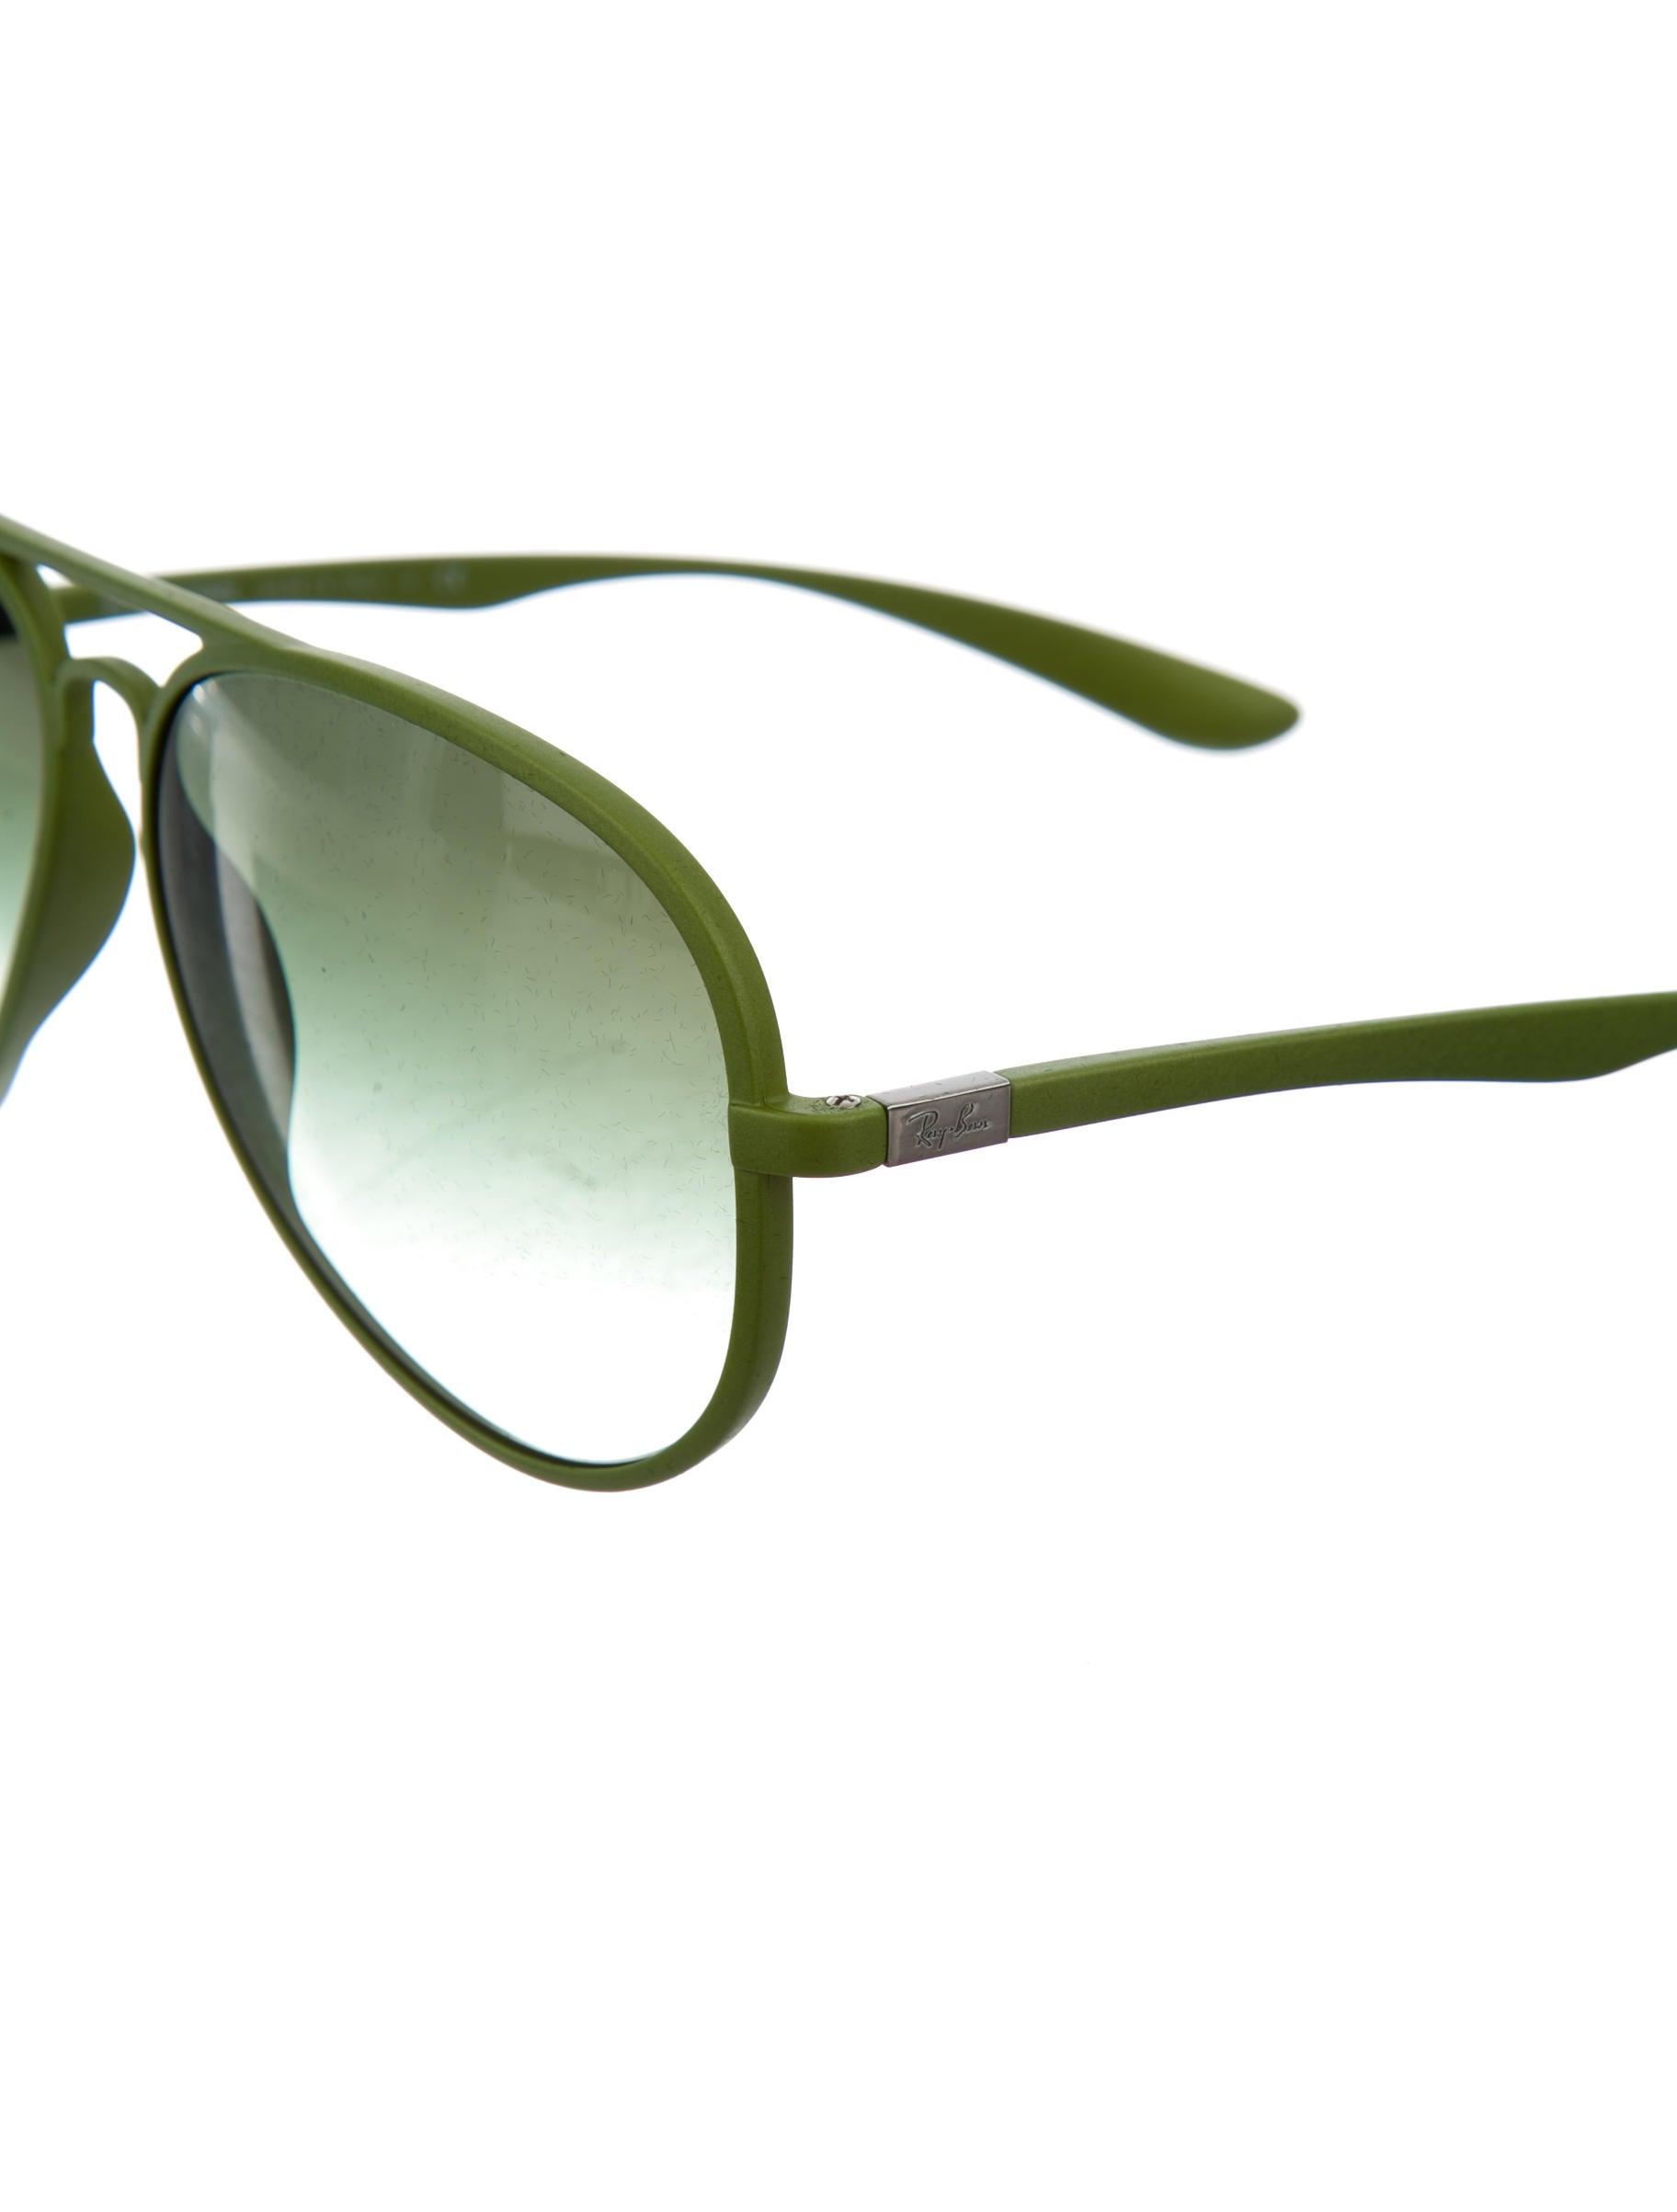 0604c15bc1 Ray Ban Sunglasses Mens Accessories « Heritage Malta